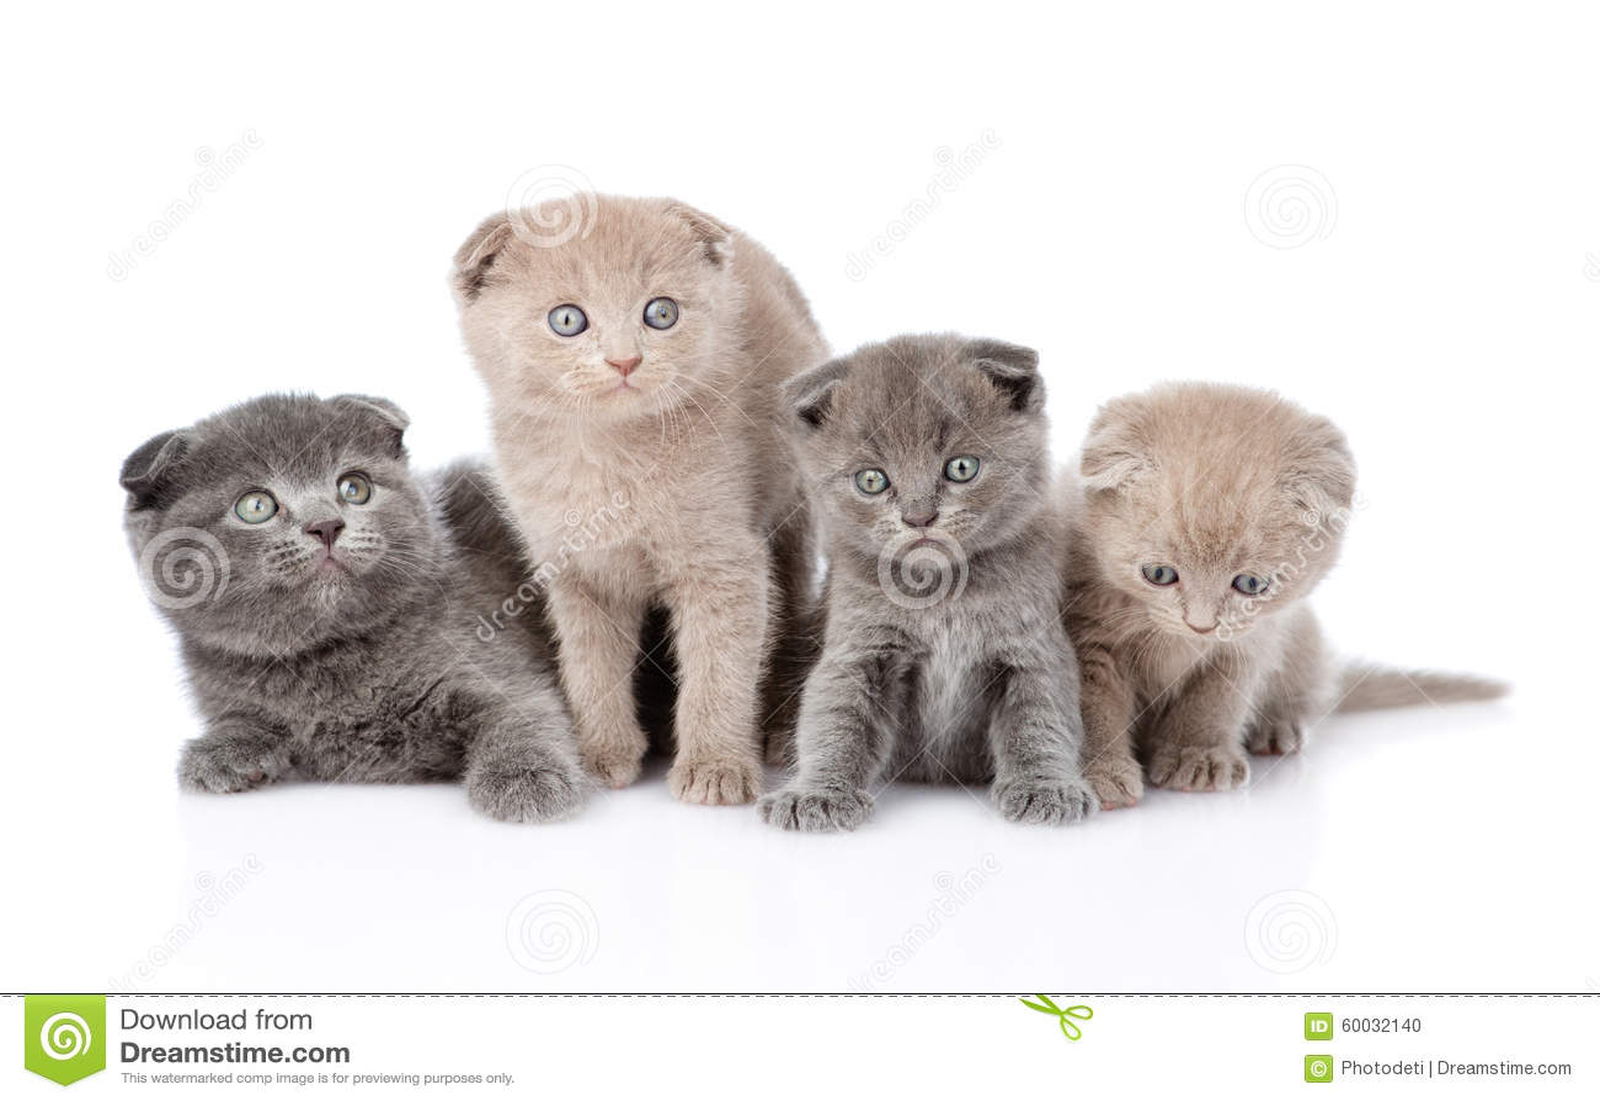 Group scottish baby kittens. isolated on white background